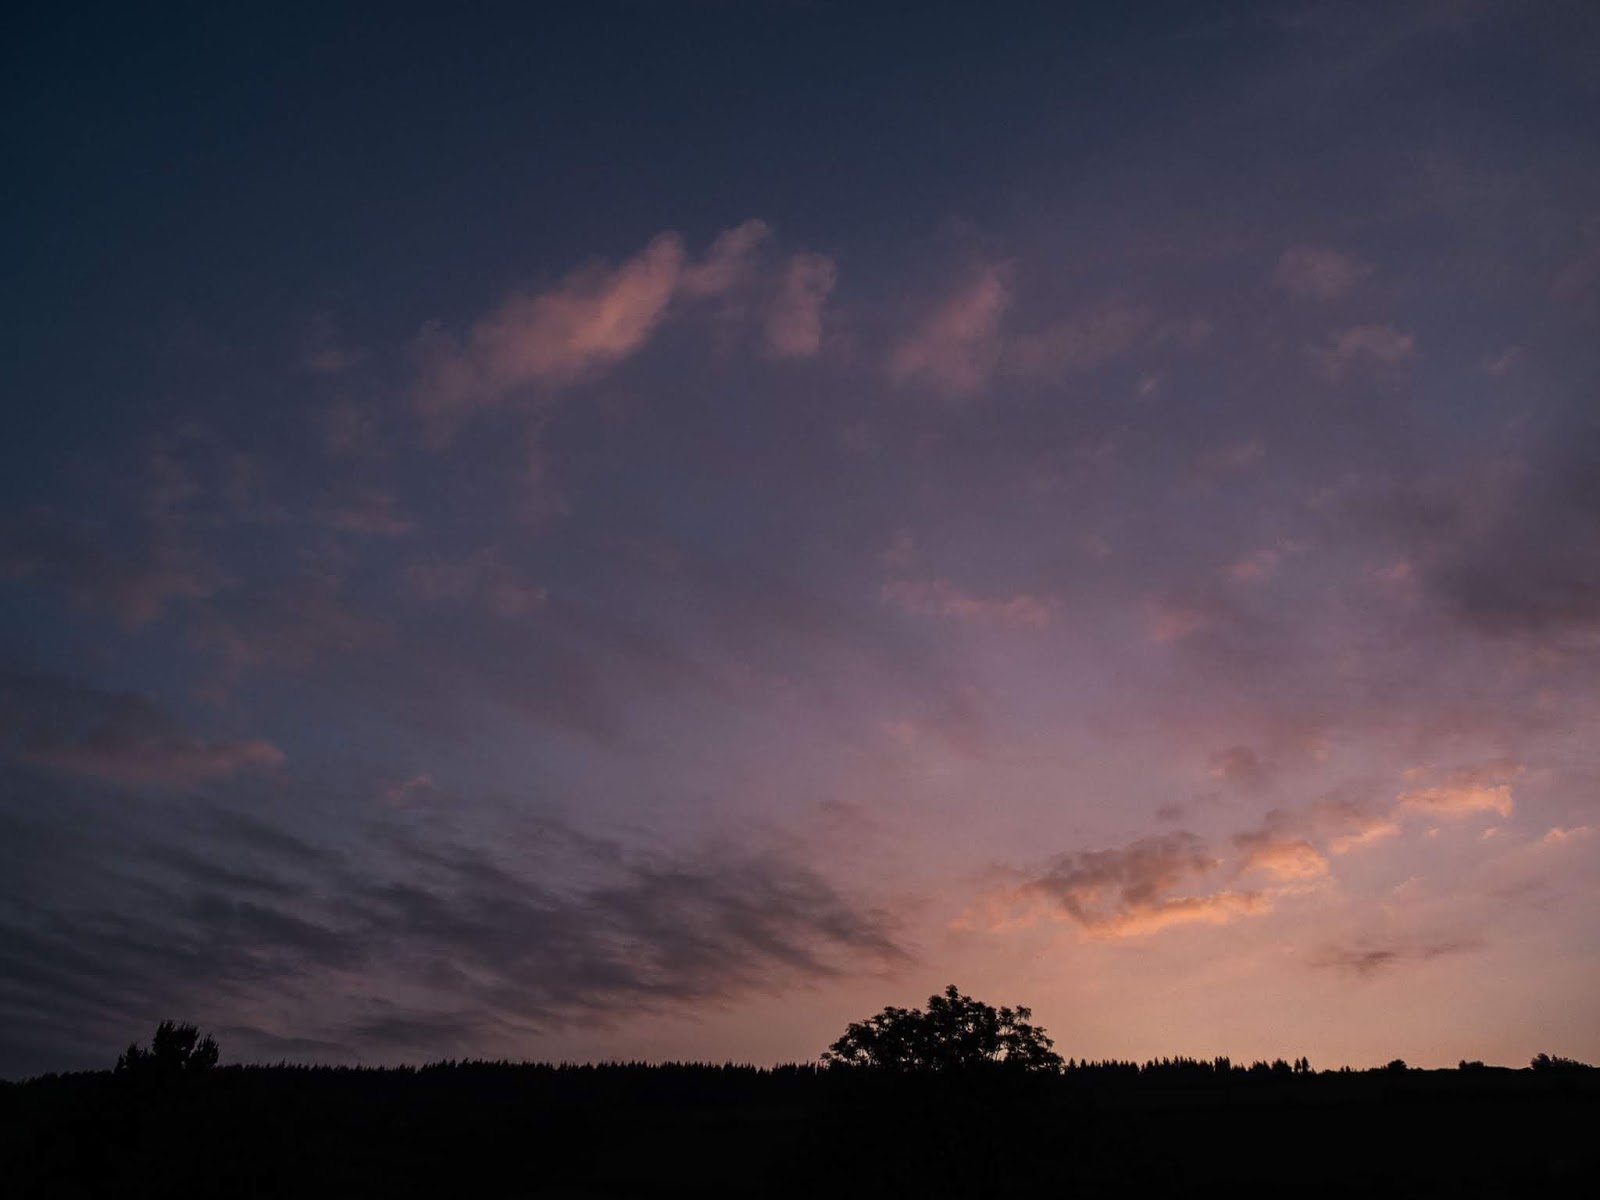 Wispy pink sunset clouds on a blue sky.